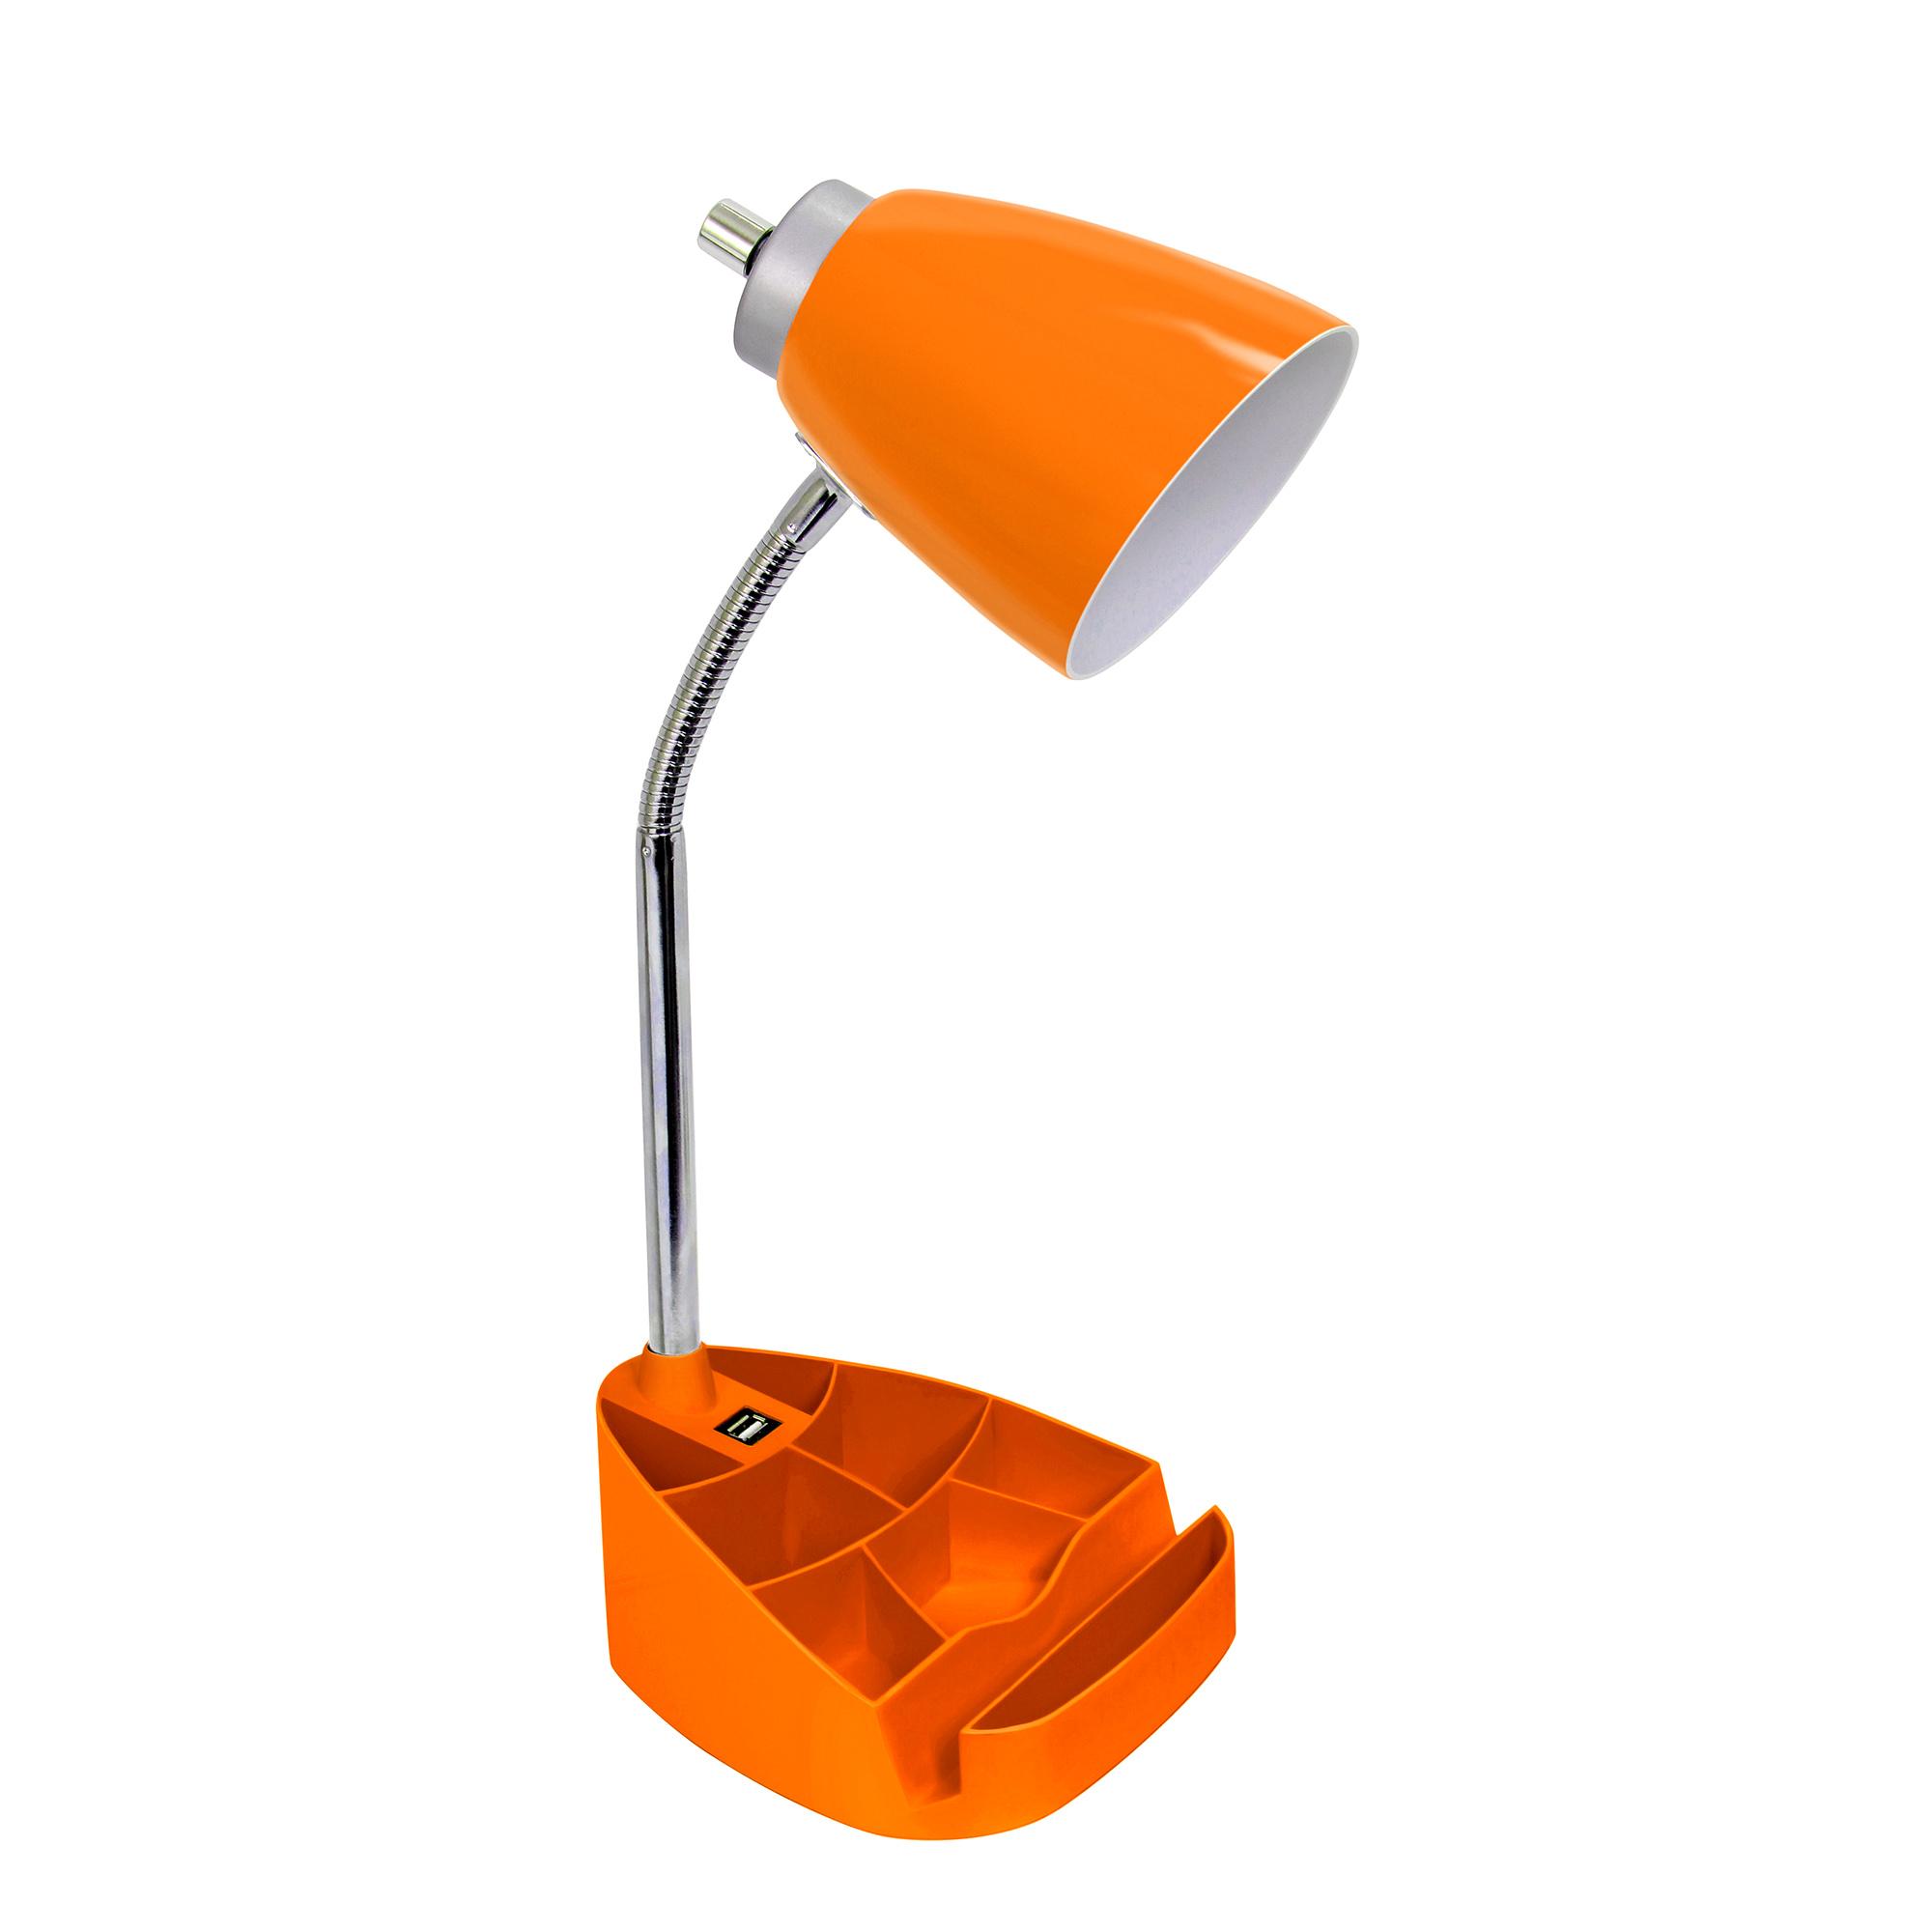 Limelights Gooseneck Organizer Desk Lamp with iPad Tablet Stand Book Holder and USB port, Orange